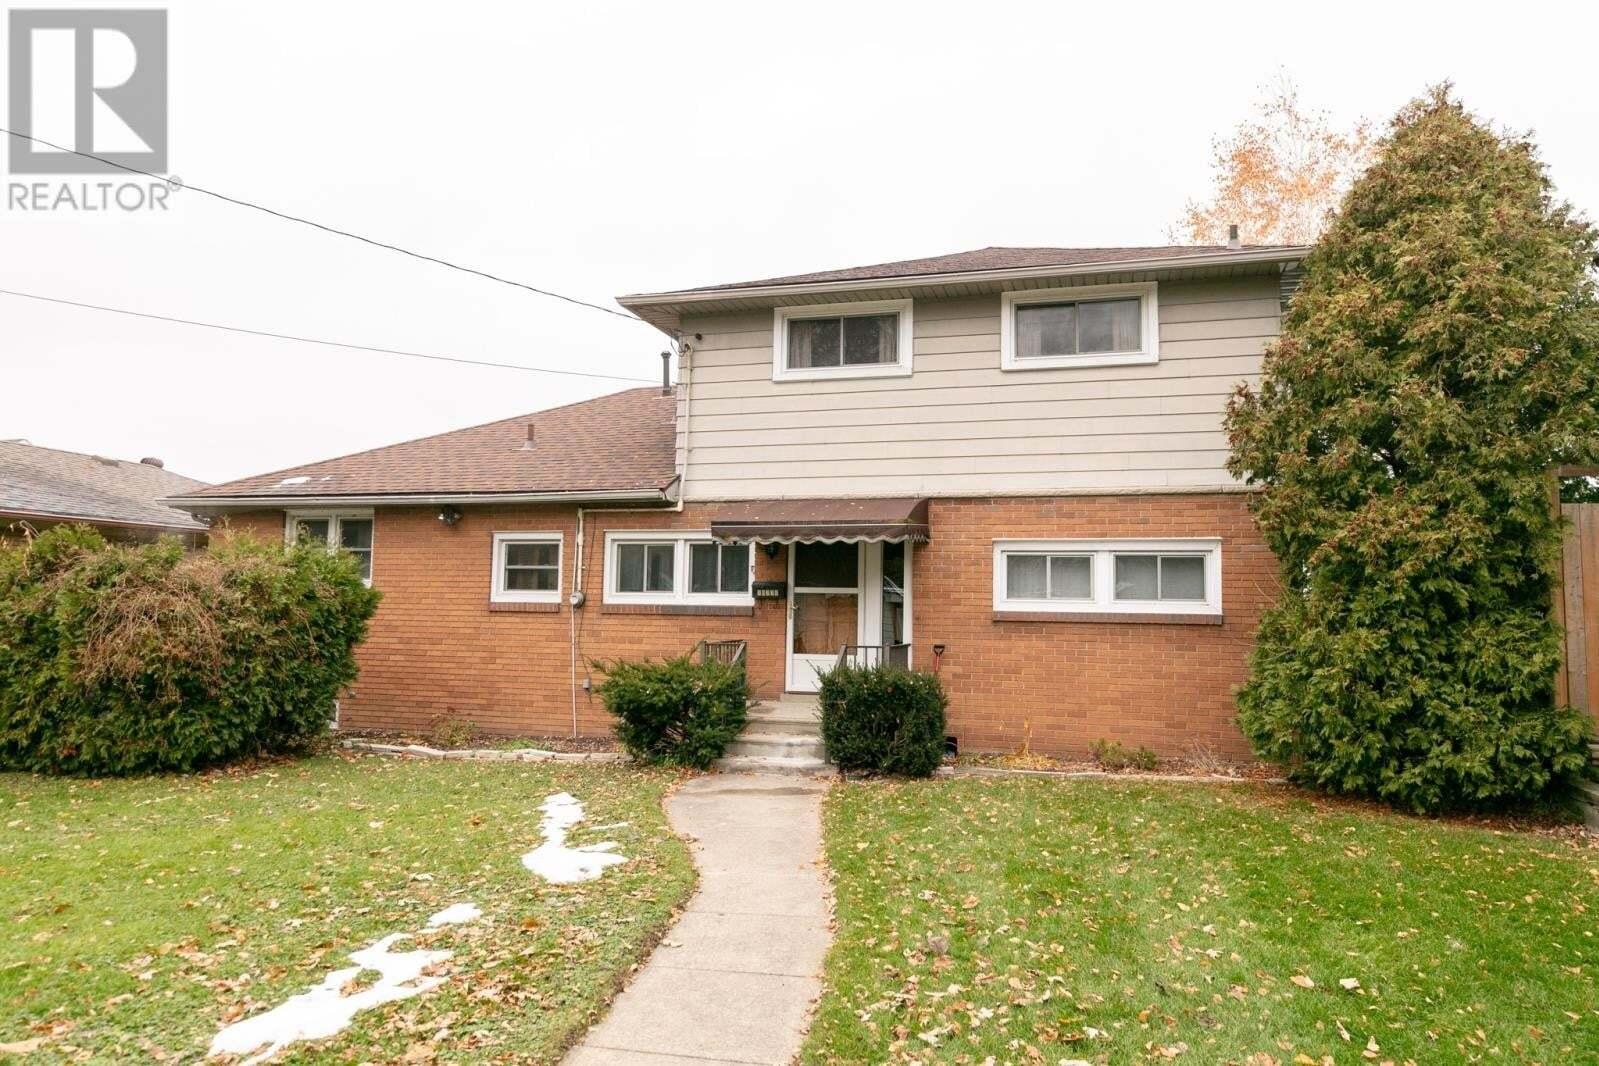 House for sale at 10770 Riverside Dr East Windsor Ontario - MLS: 20011469